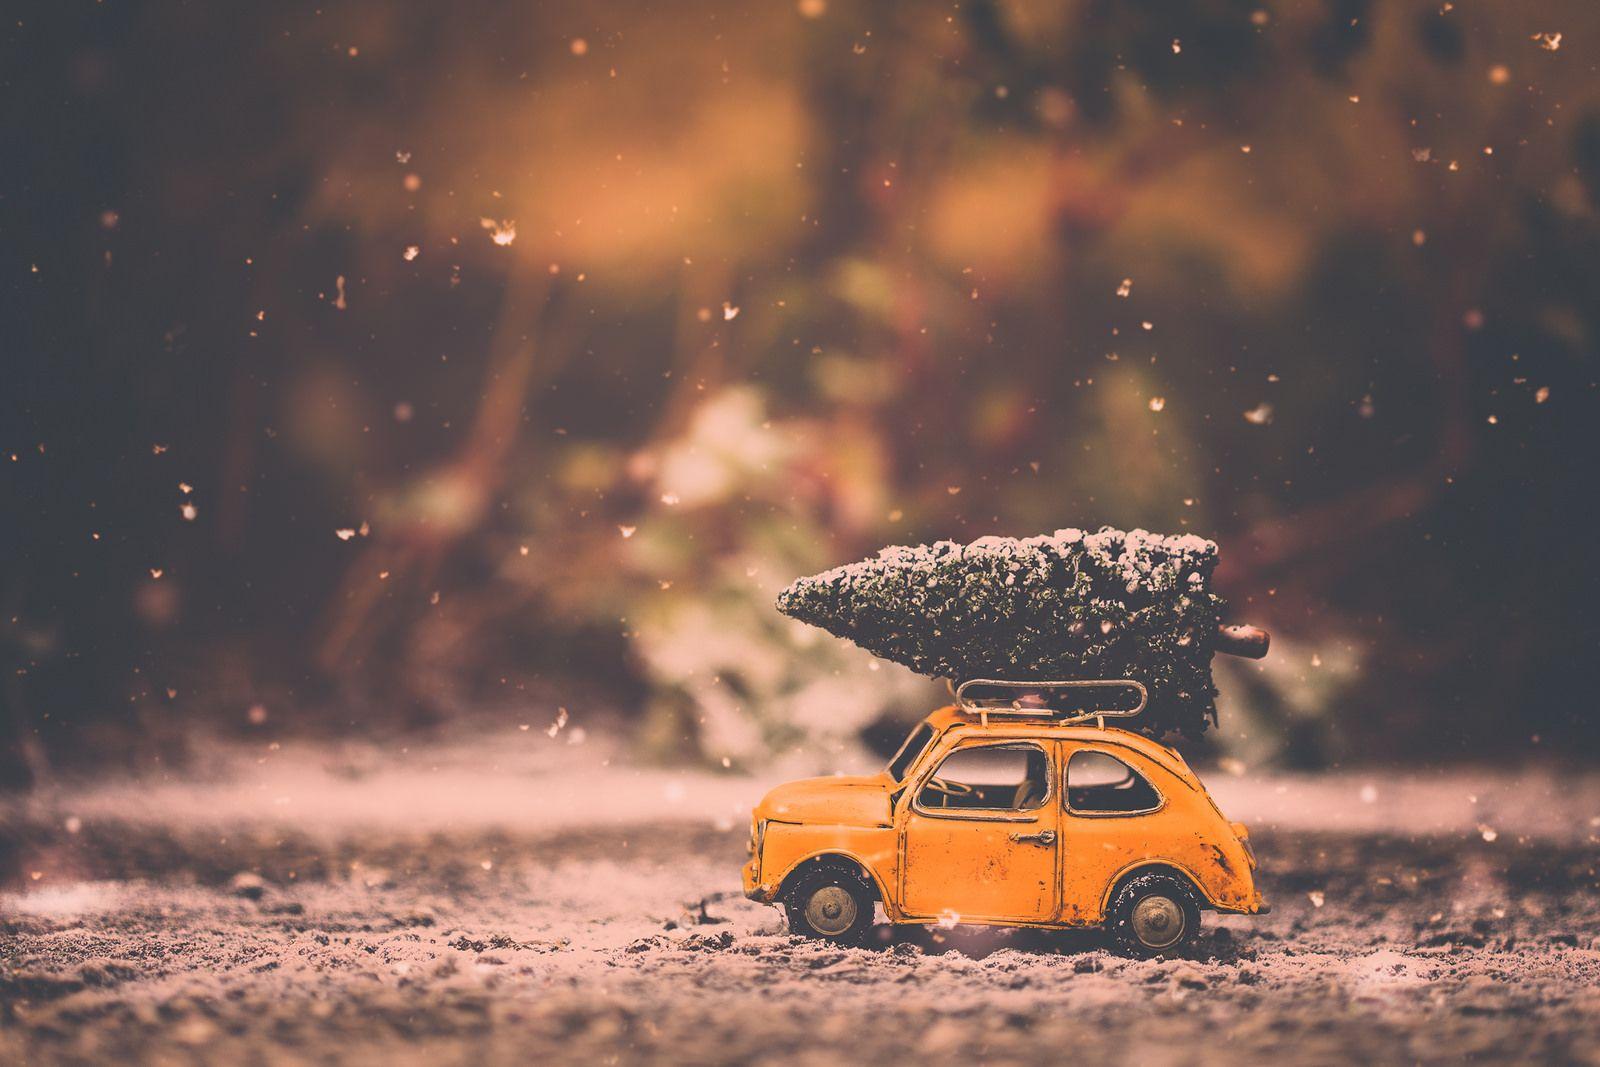 Merry Christmas Disney Cars Wallpaper Beetle Car Love Wallpaper Backgrounds